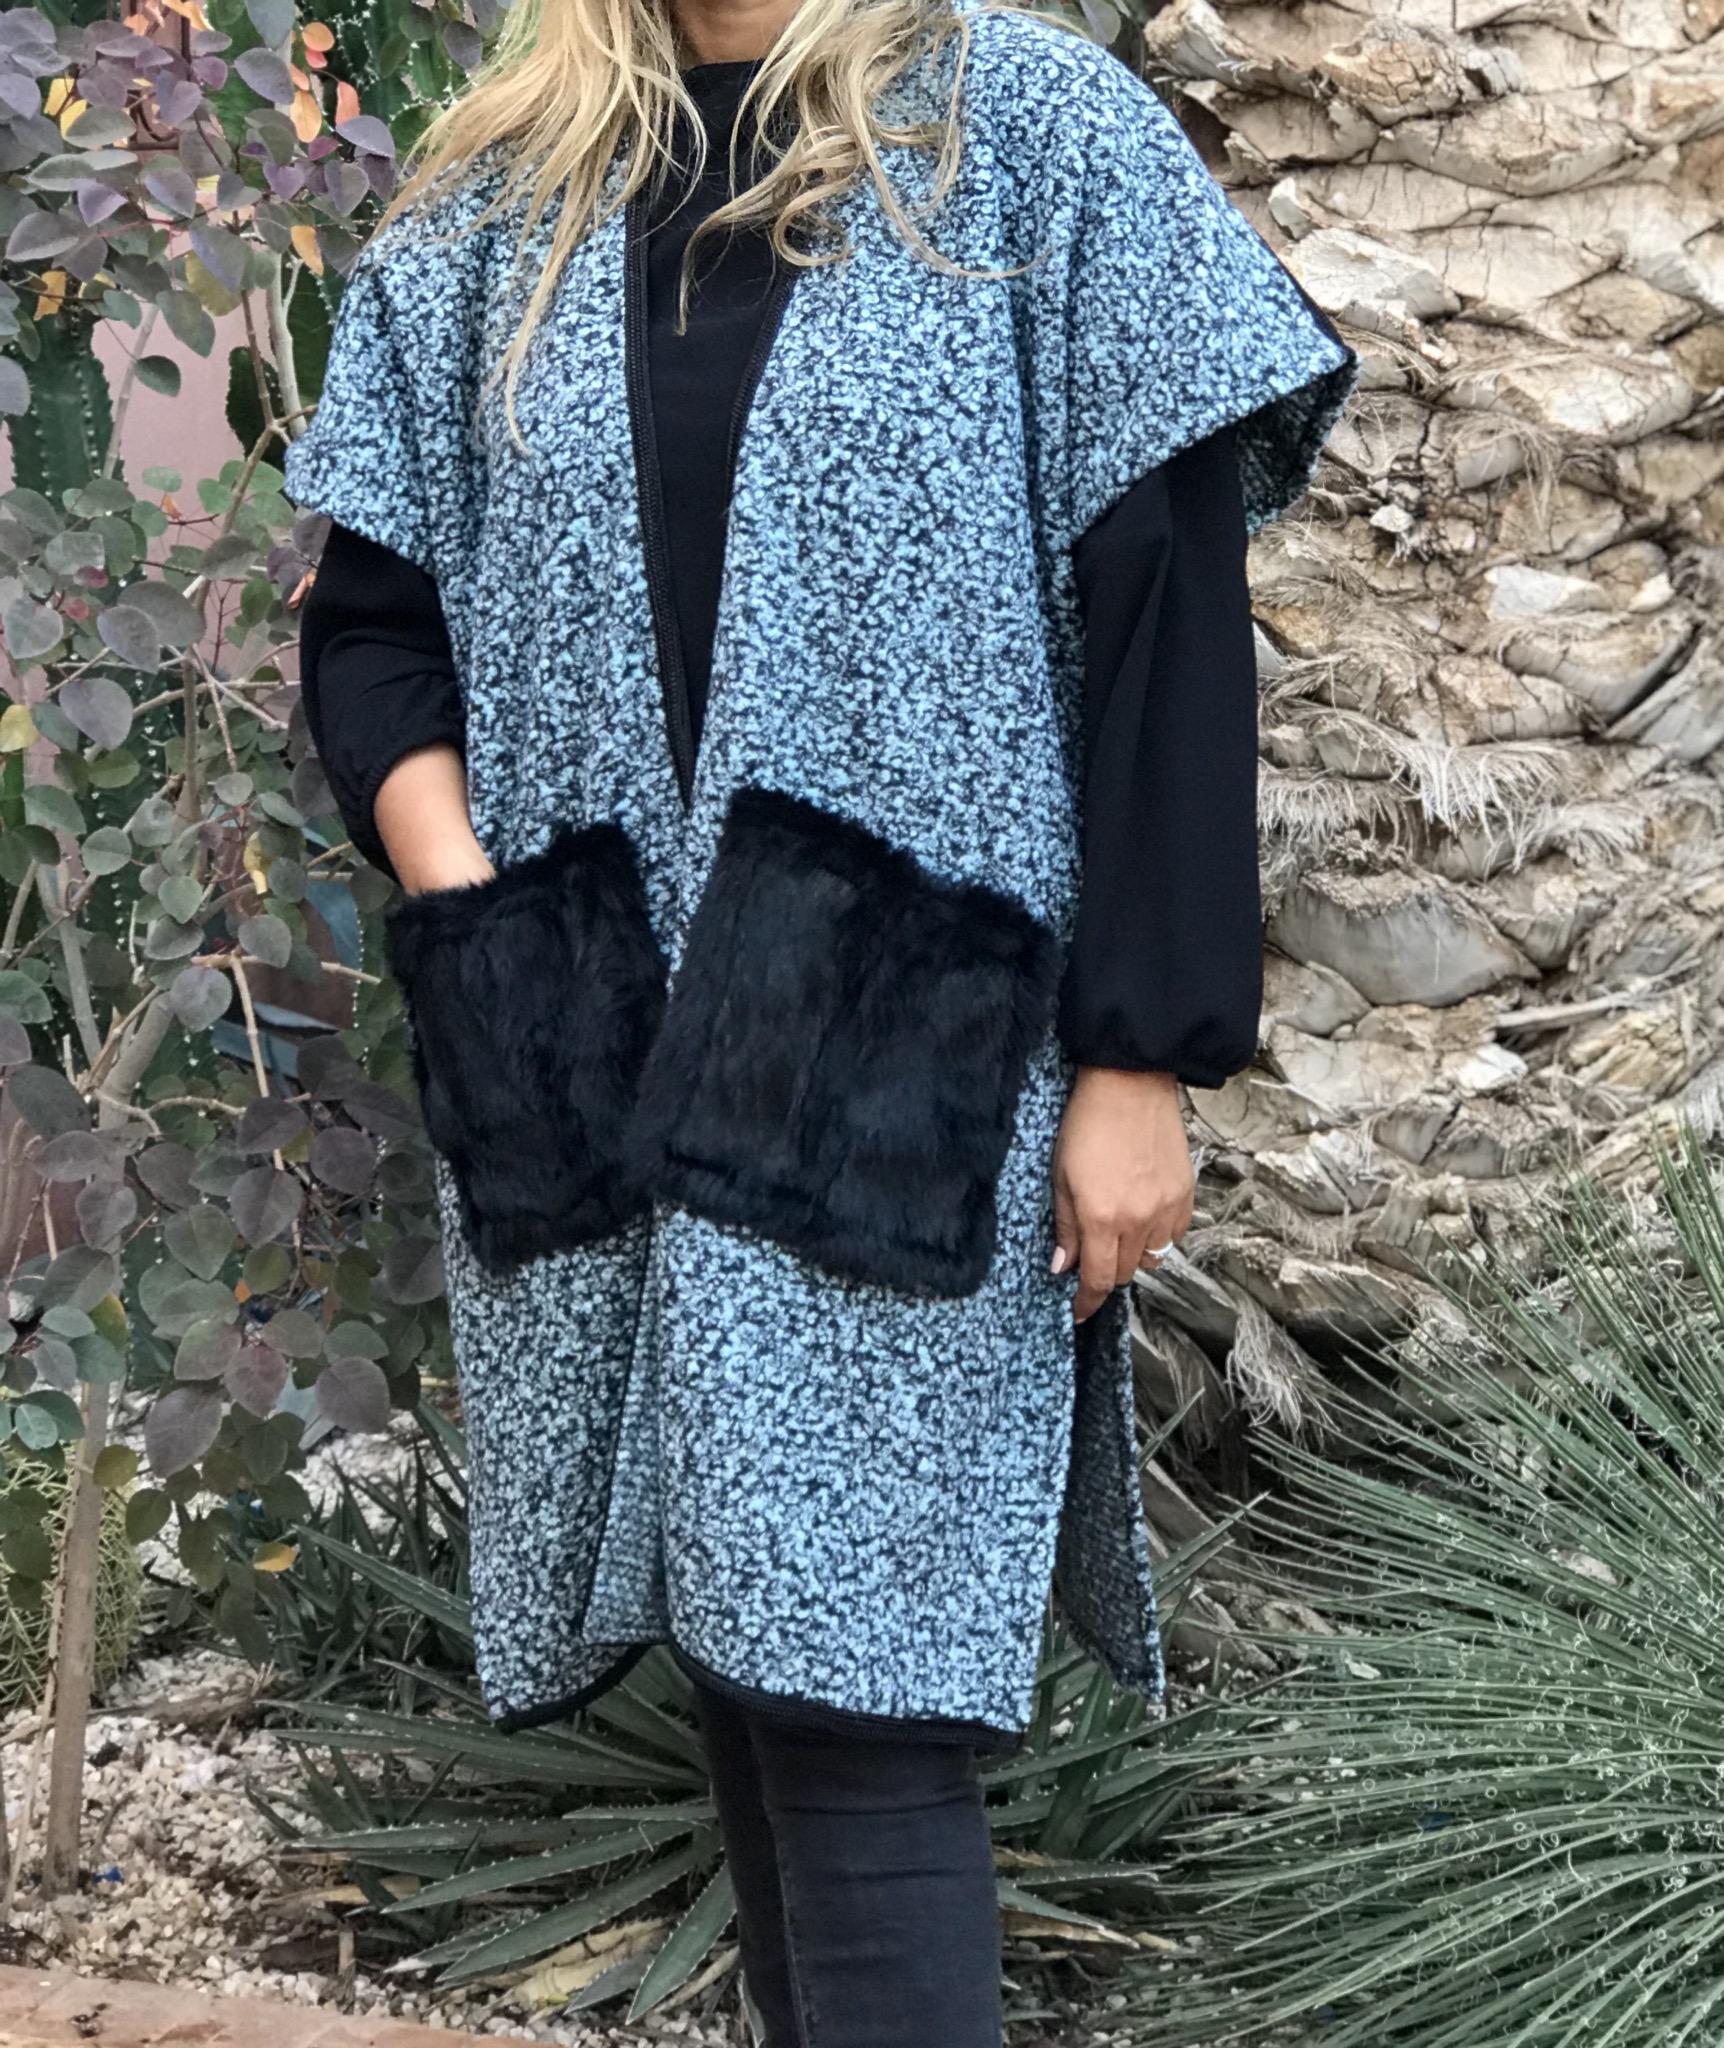 Kimono tweed blue black with black fur pockets